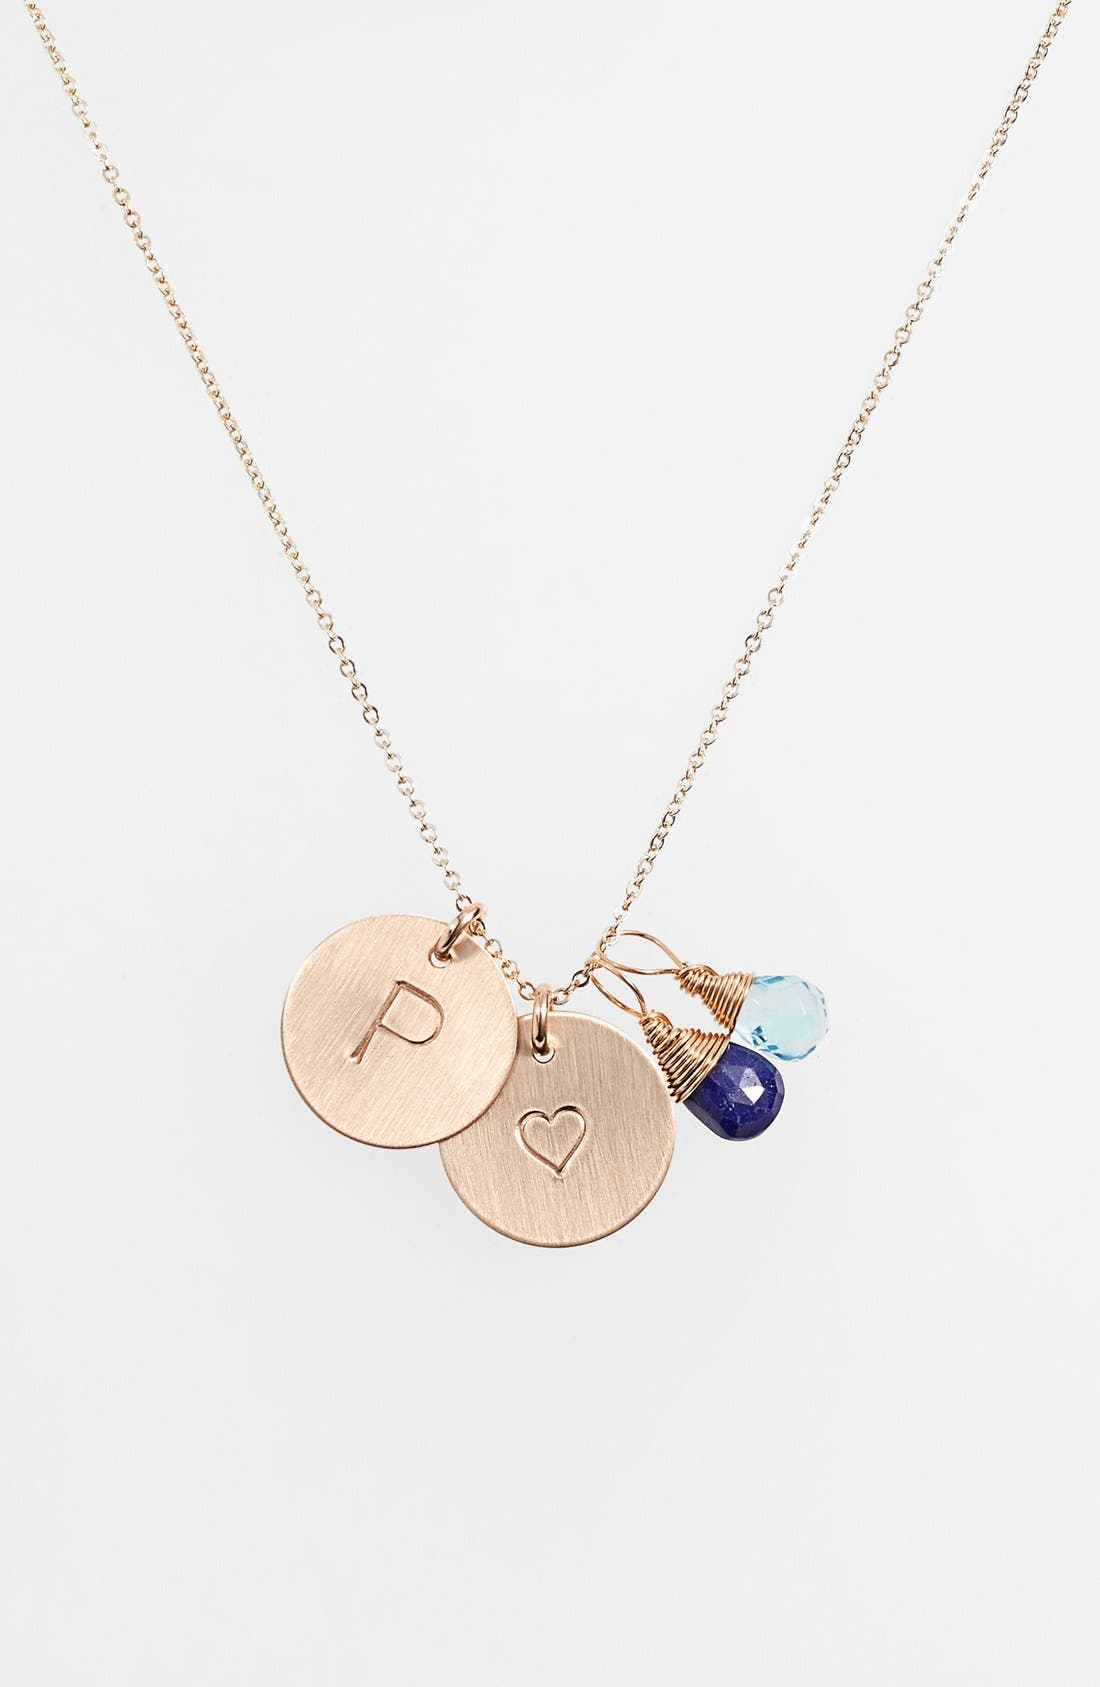 Blue Quartz Initial & Heart 14k-Gold Fill Disc Necklace,                         Main,                         color, Royal Blue And Ocean Blue P